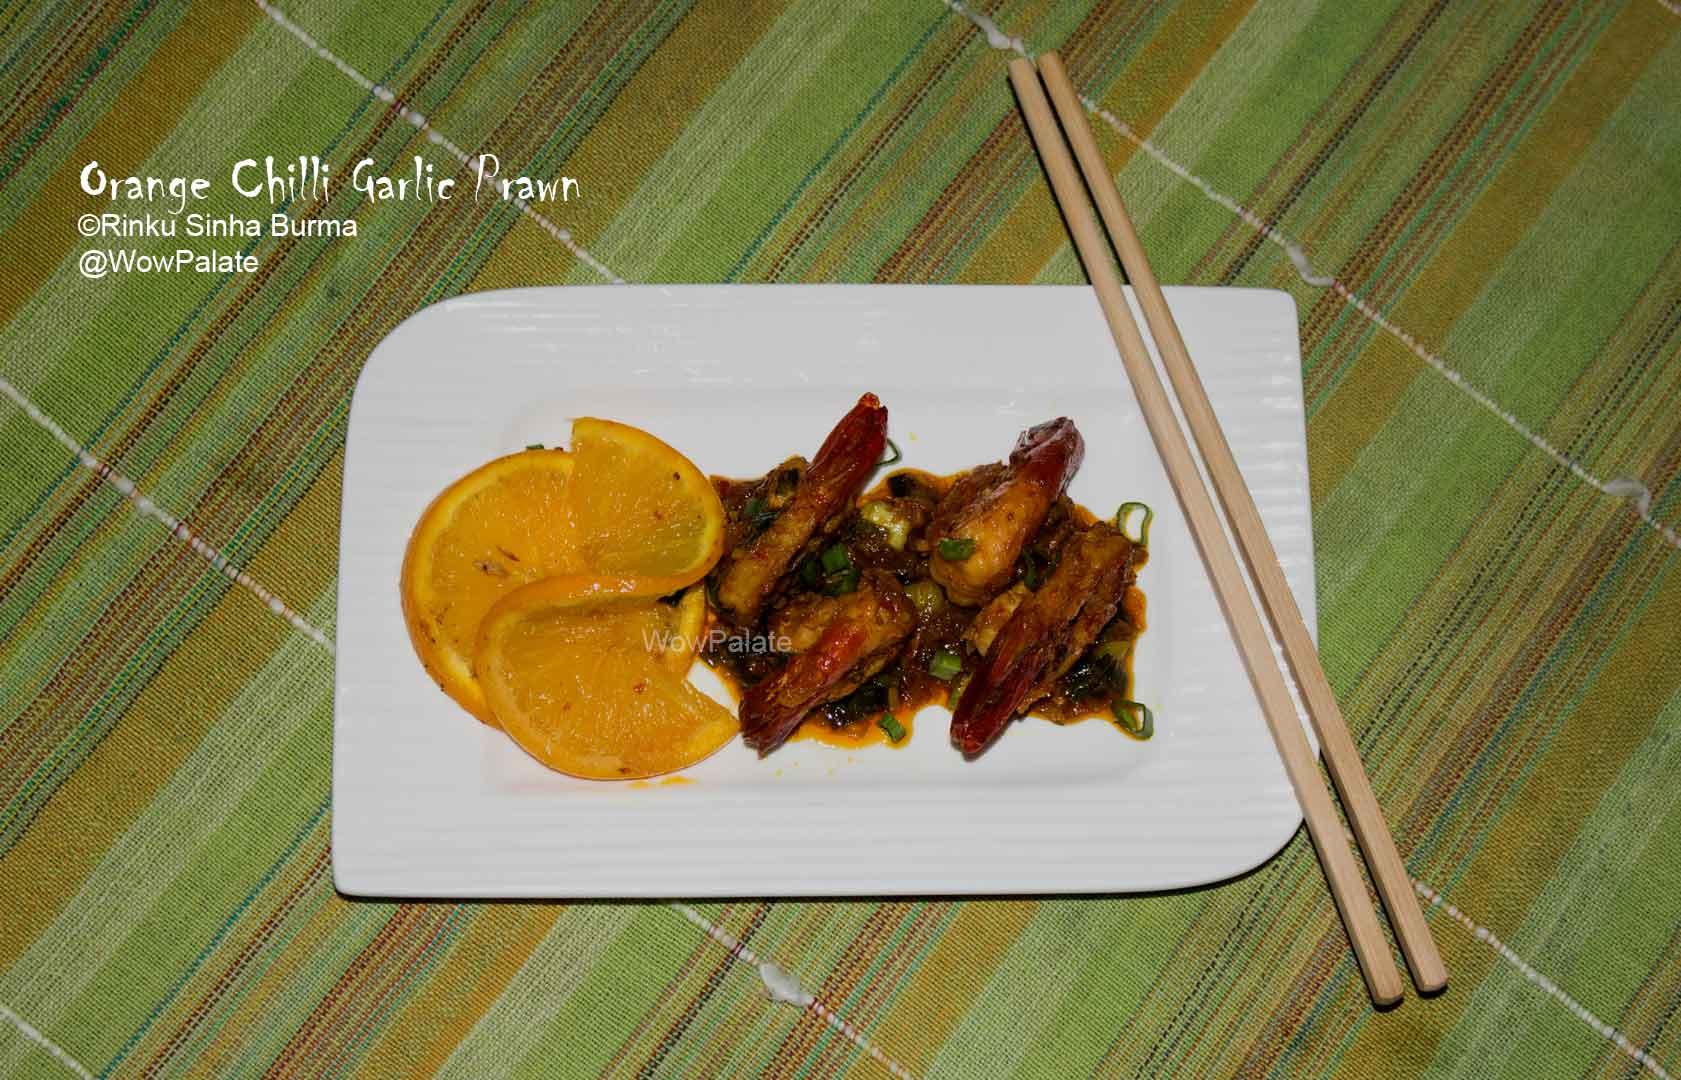 Orange Chilli Garlic Prawn